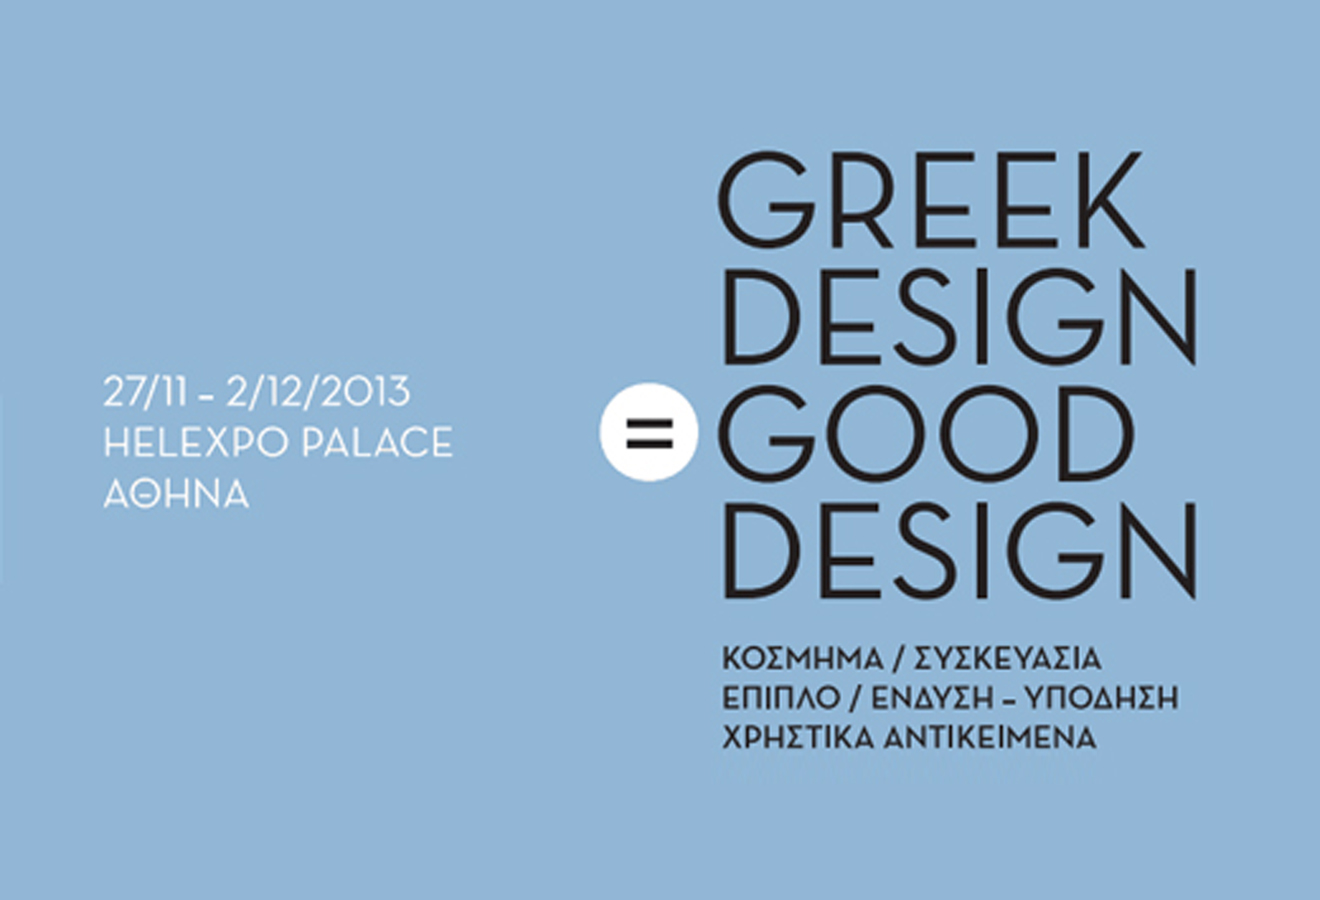 Greek Design= Good Design